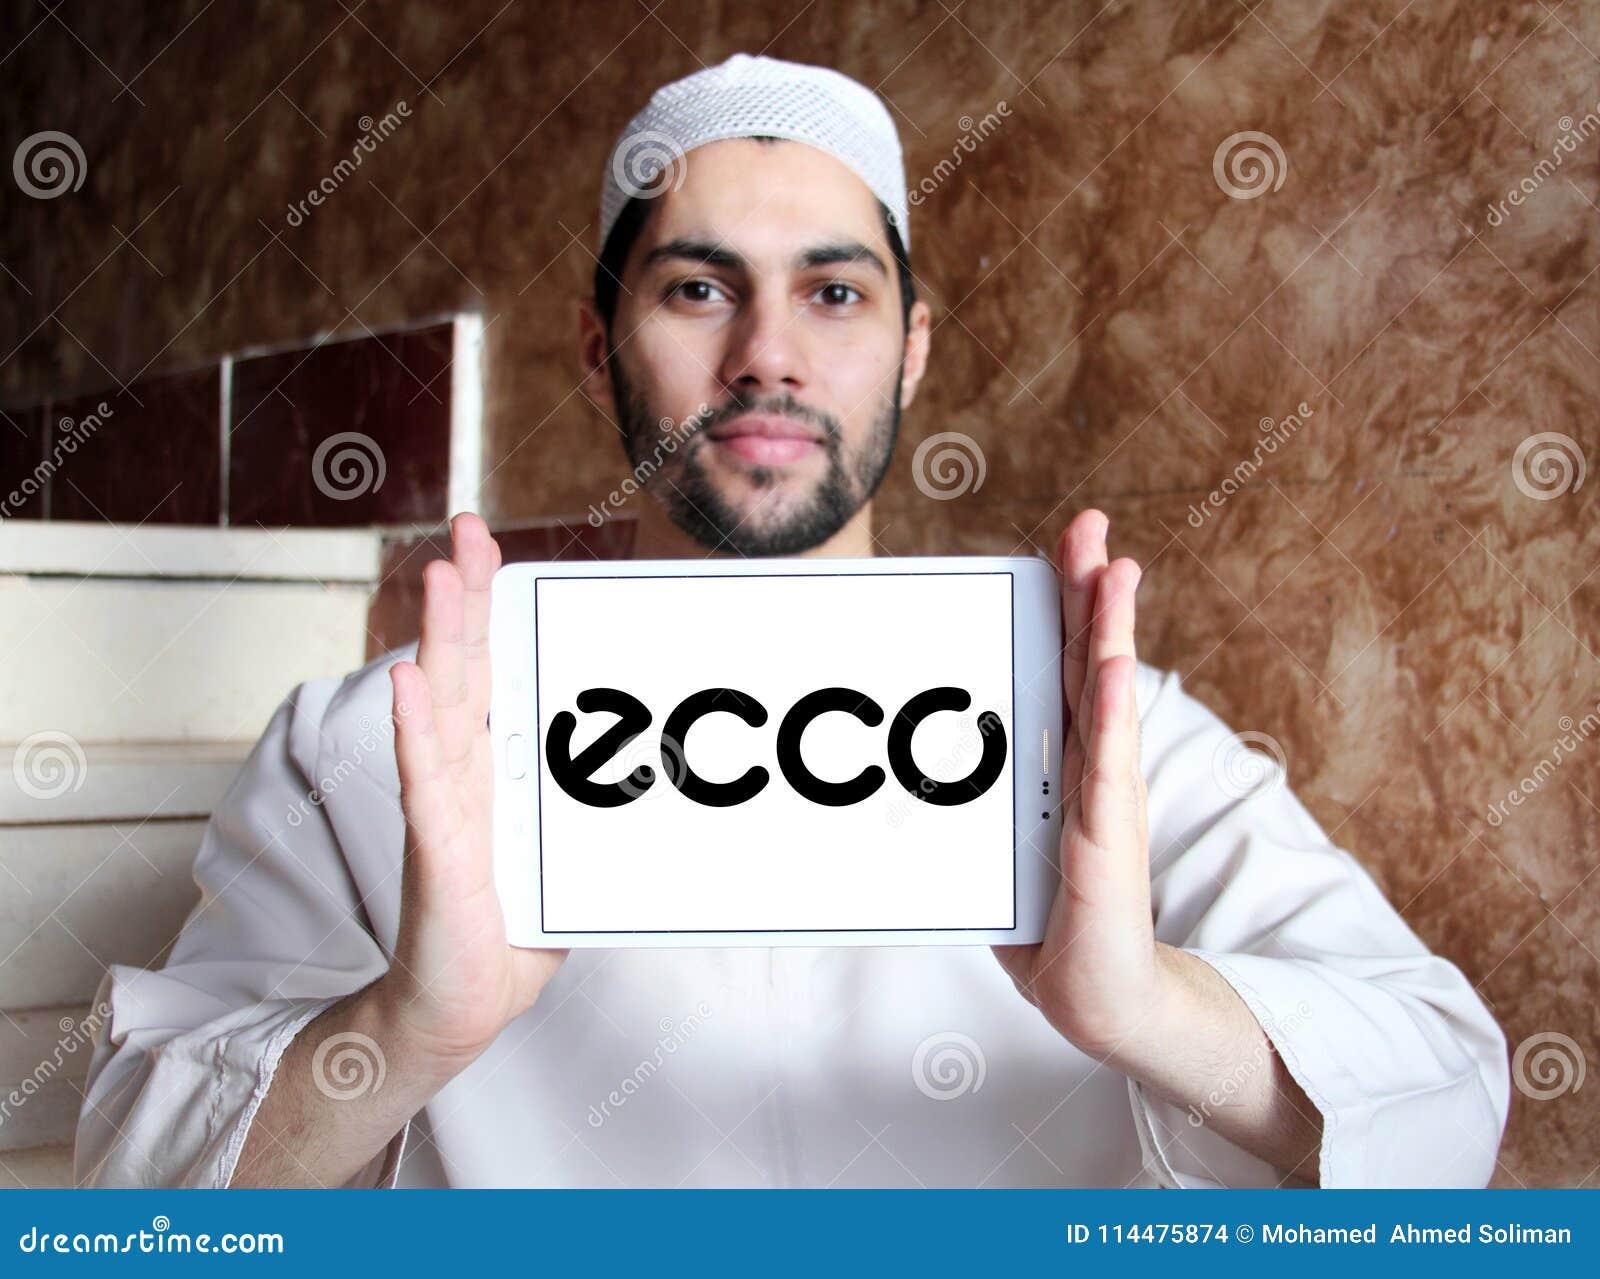 Ecco Editorial Brands Shoe Manufacturer Stock Of Logo Image Nn0w8PXOk